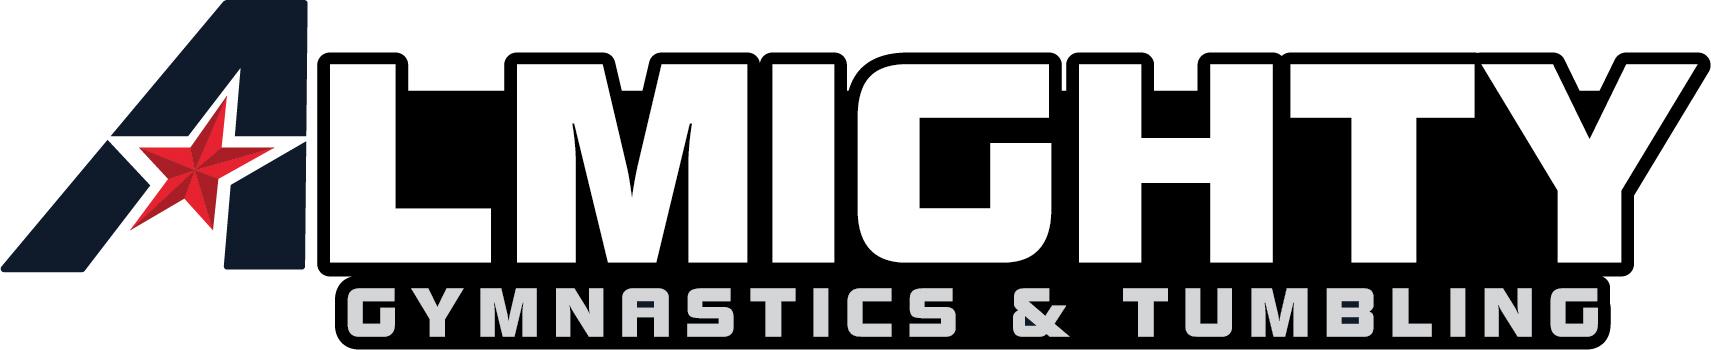 Gymnastics & Tumbling Logo